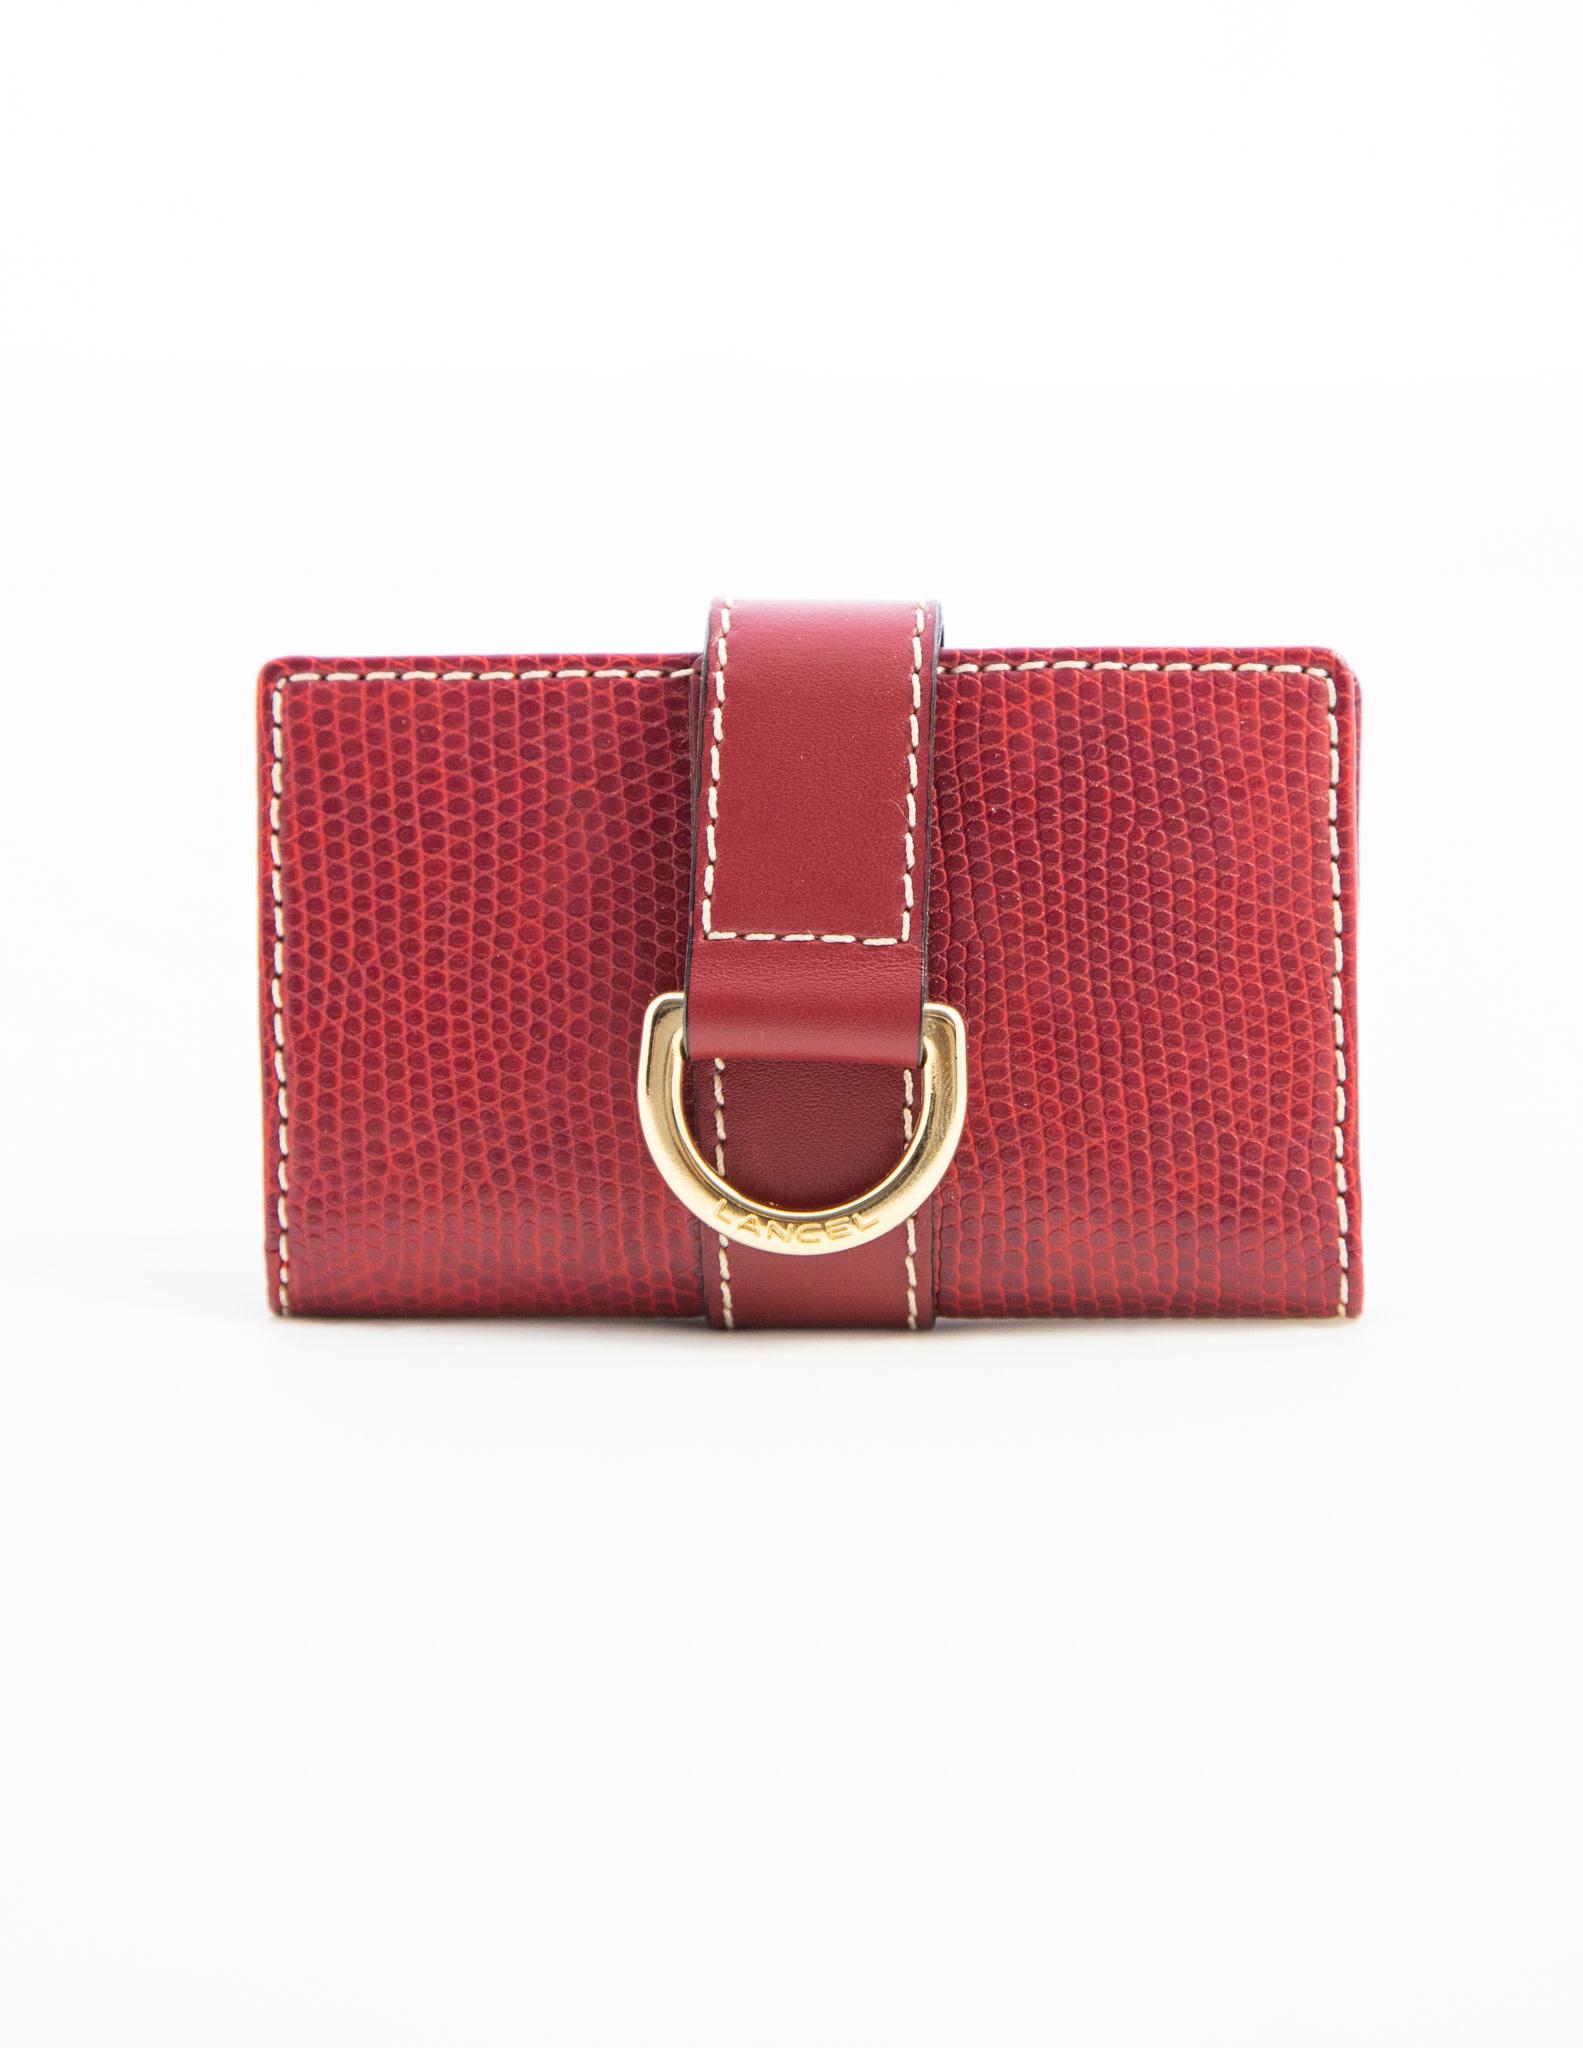 Lancel SMALL RED CARD & KEY HOLDER